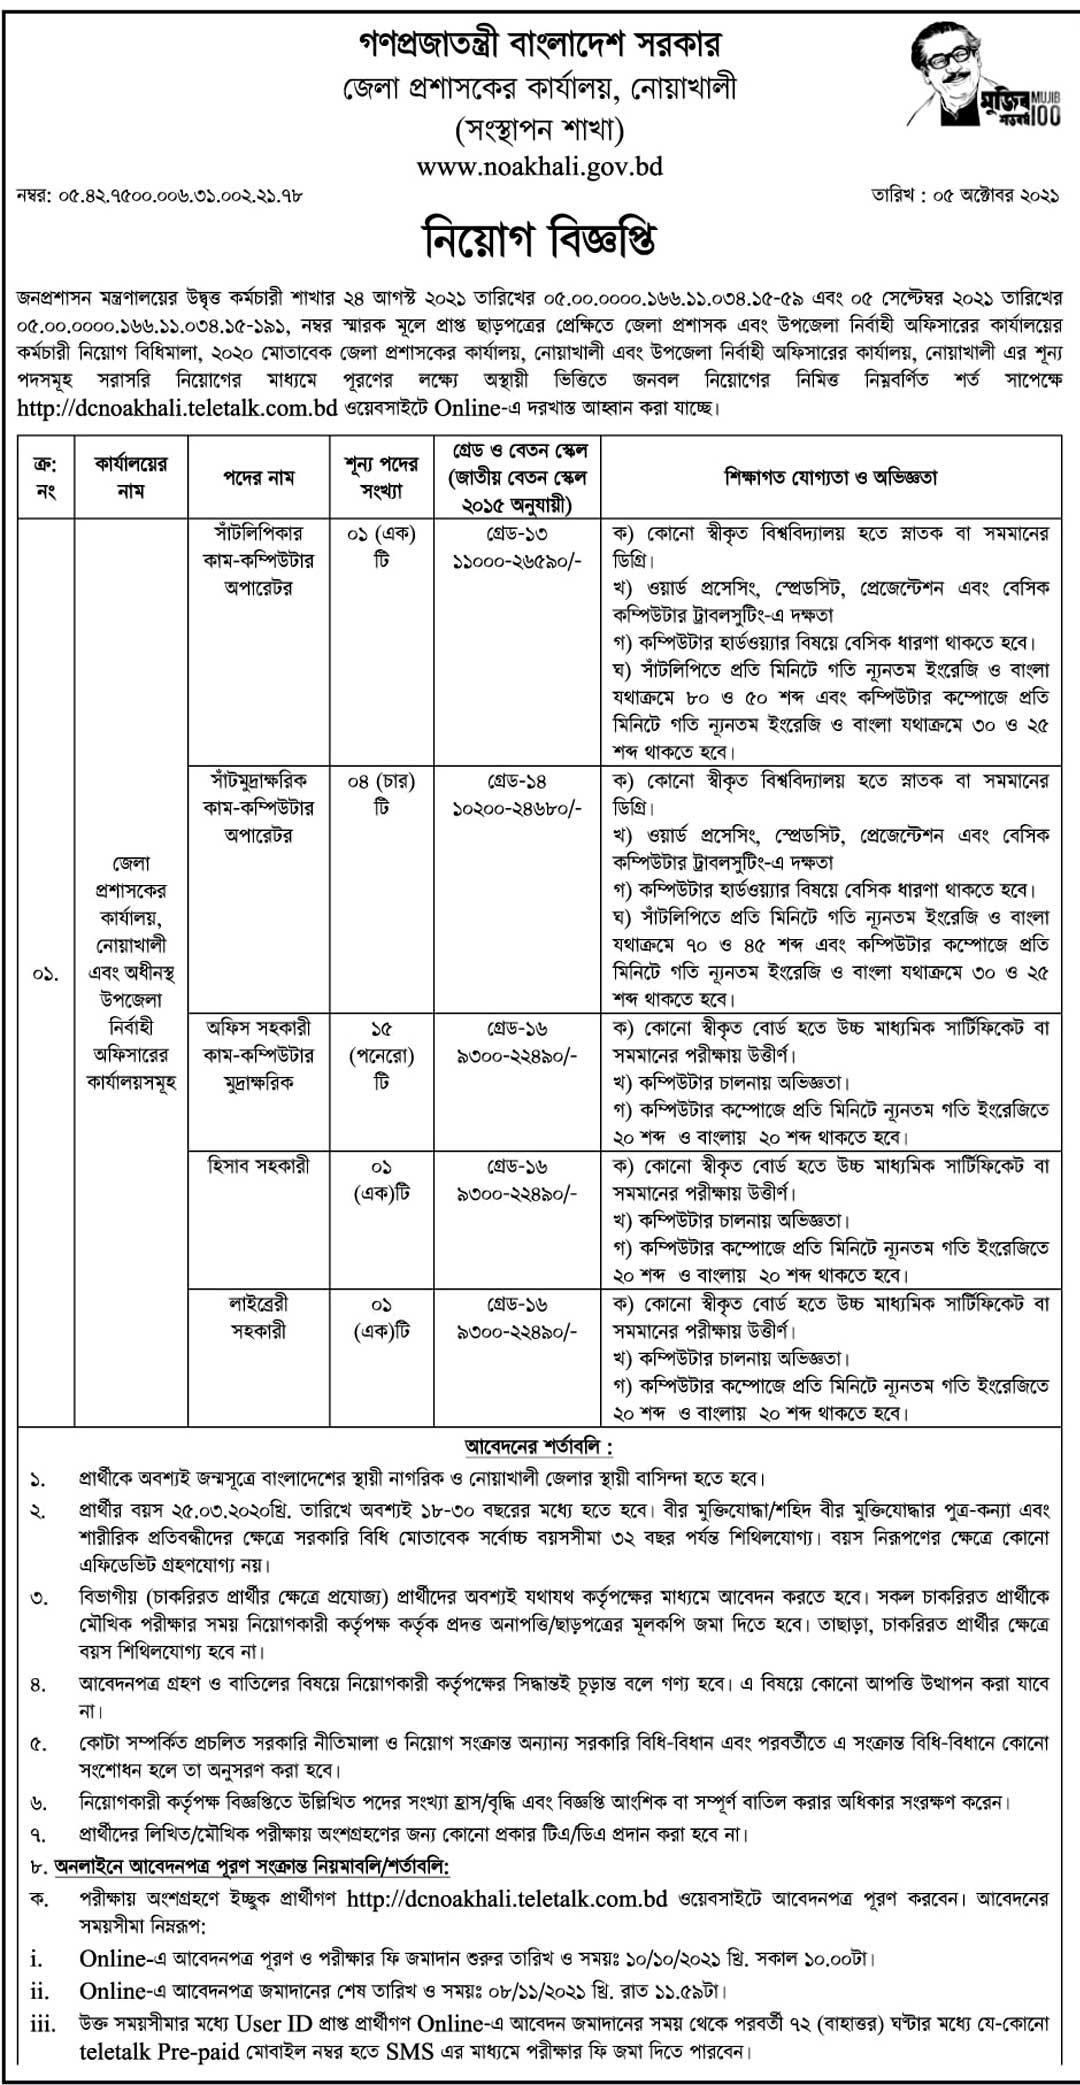 DC Noakhali Job Circular 2021 - dcnoakhali.teletalk.com.bd